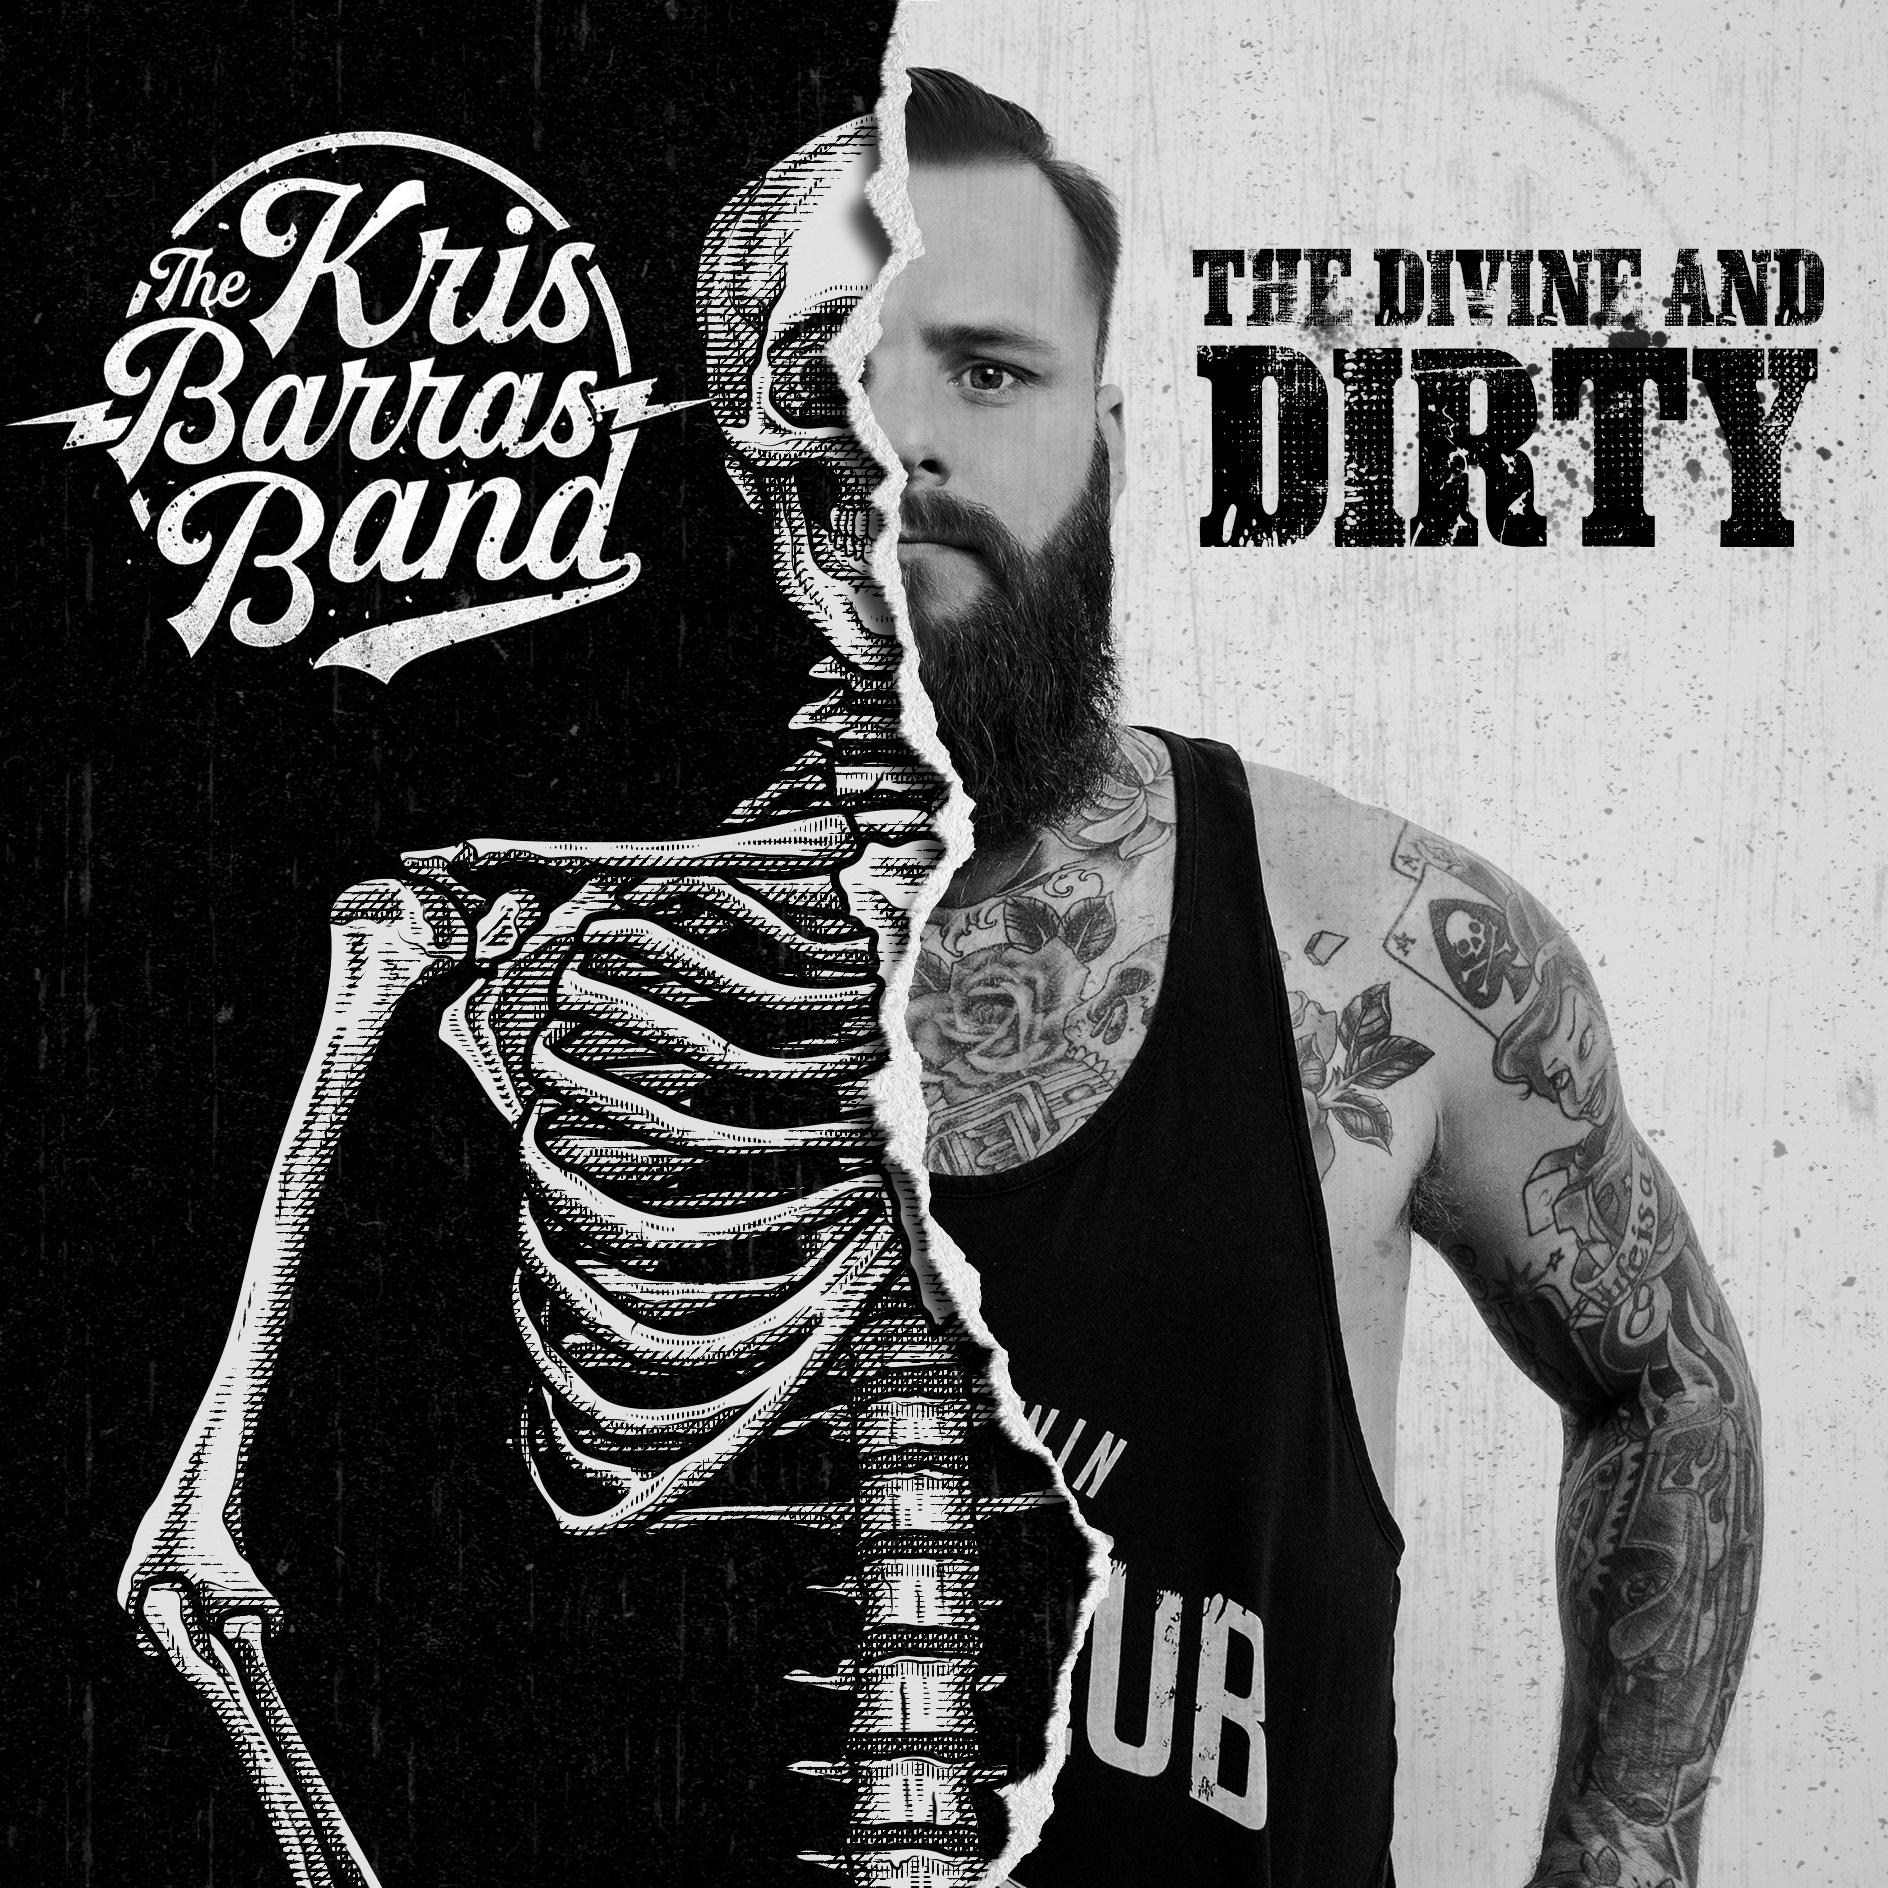 Kris Barras Band